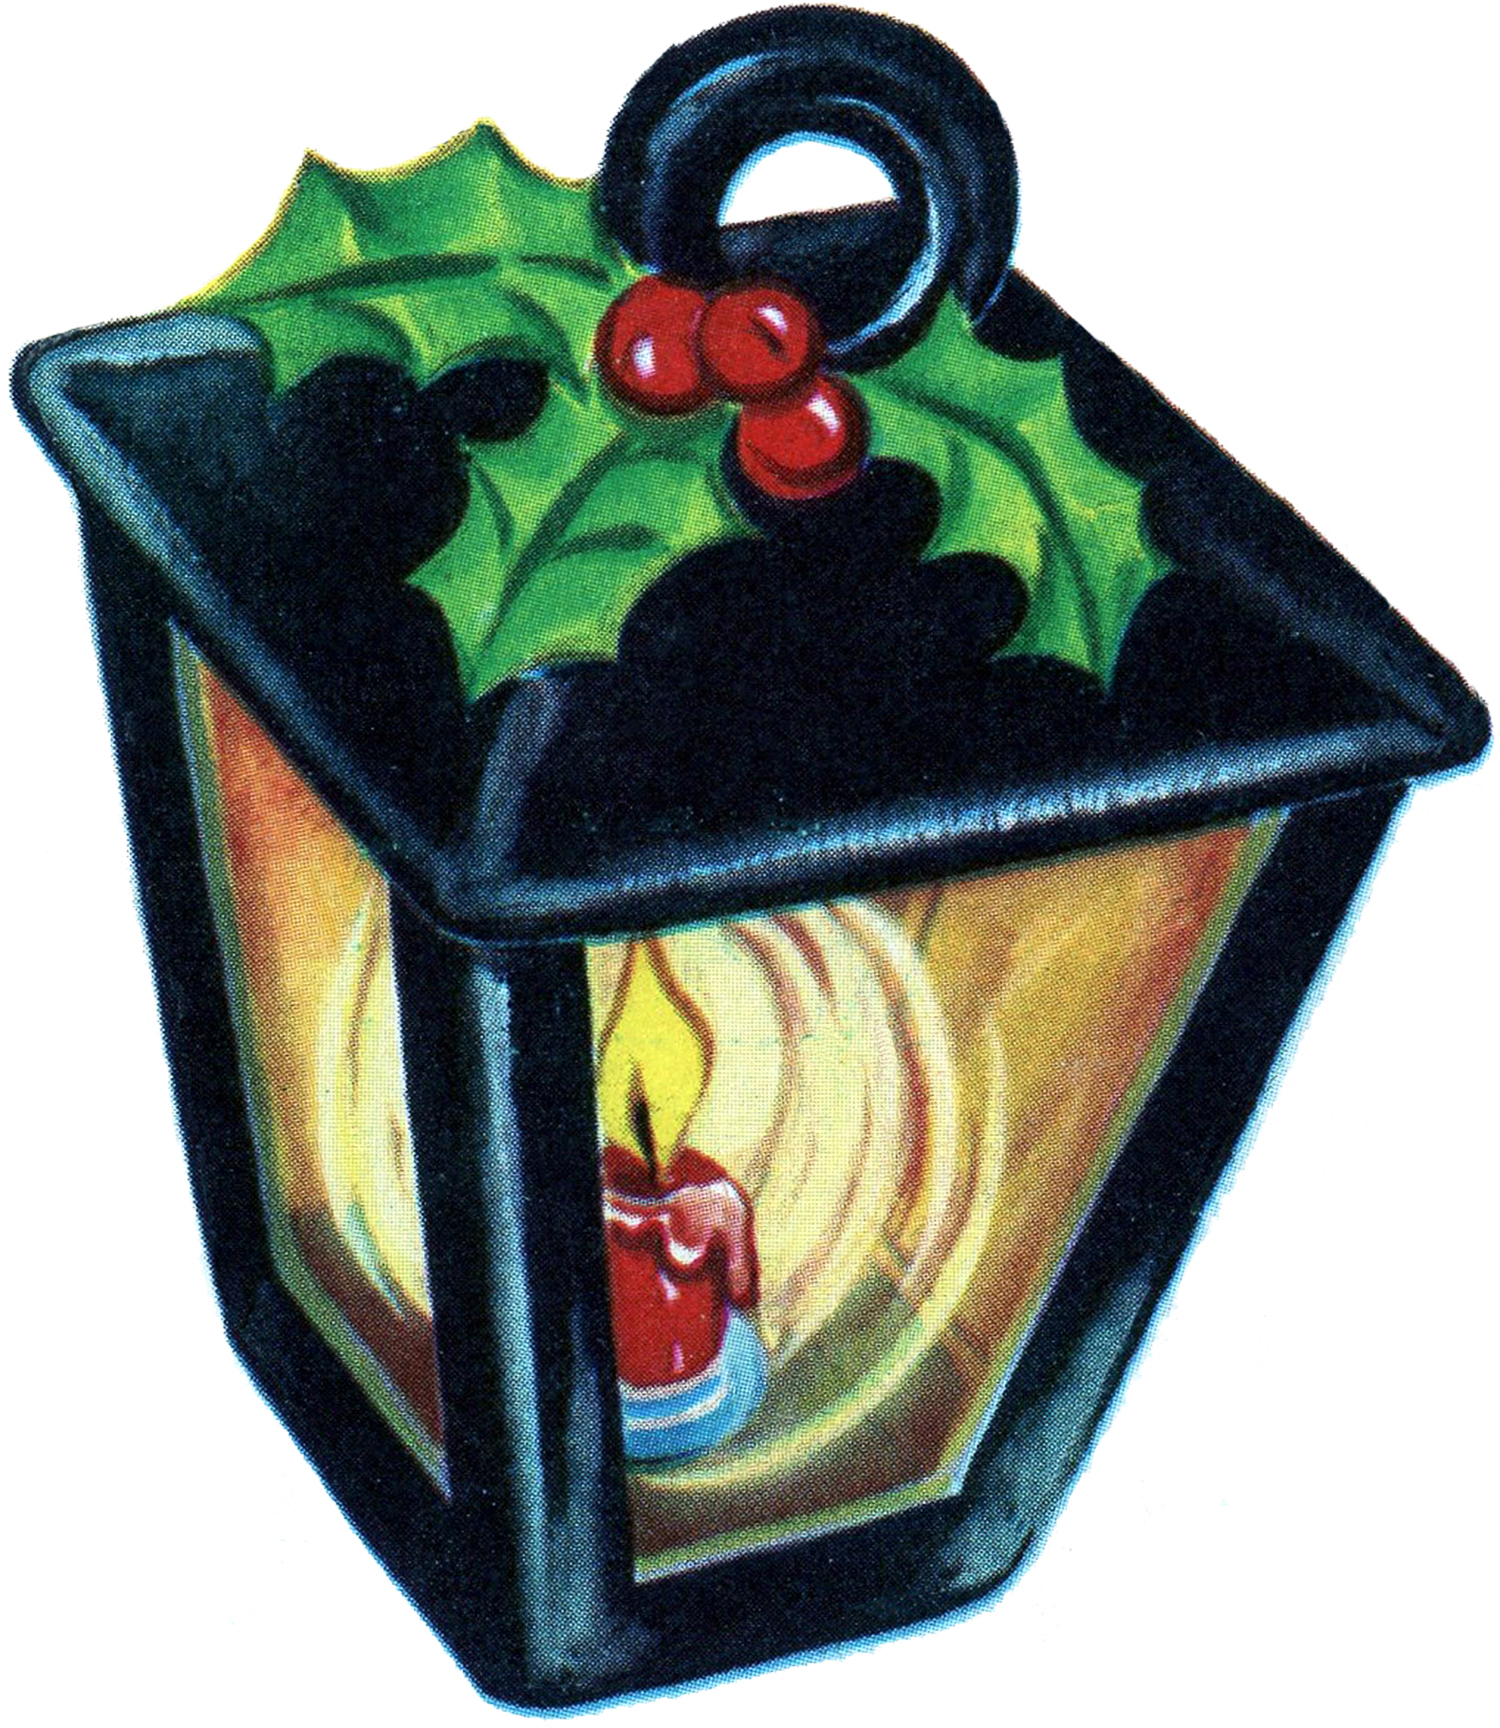 Retro Christmas Lantern Image - The Graphics Fairy